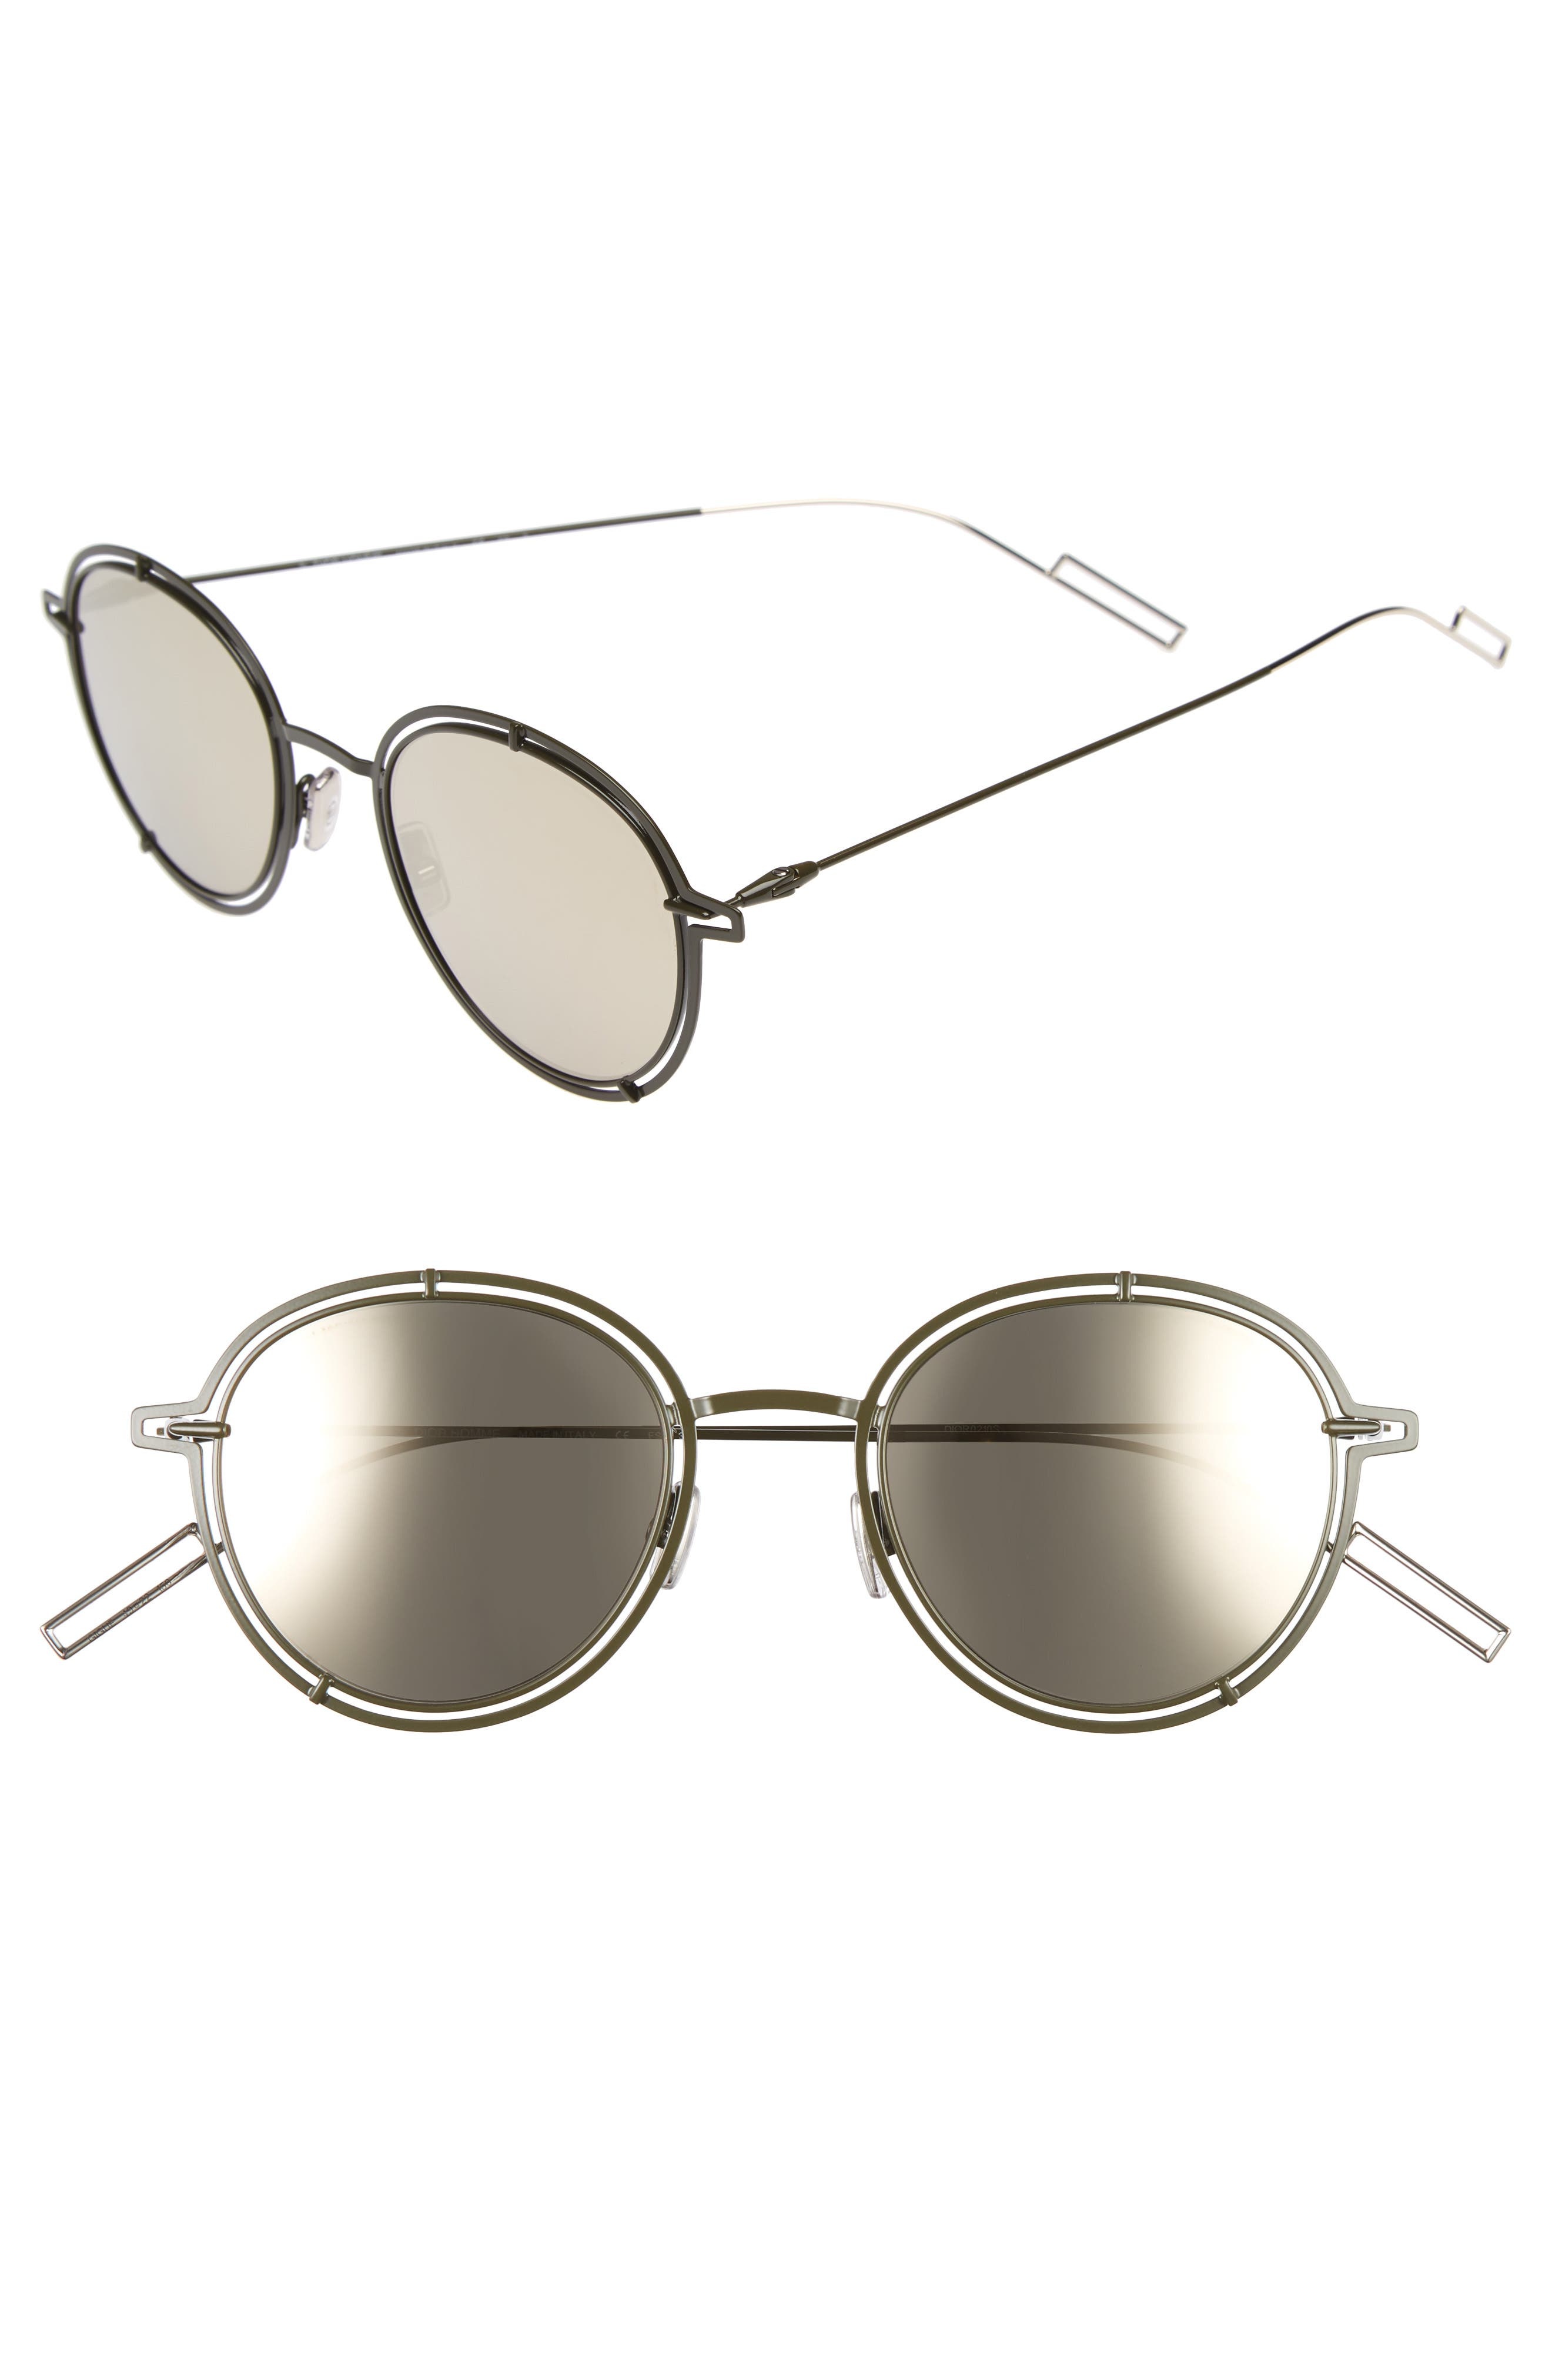 Dior Homme 49mm Round Sunglasses